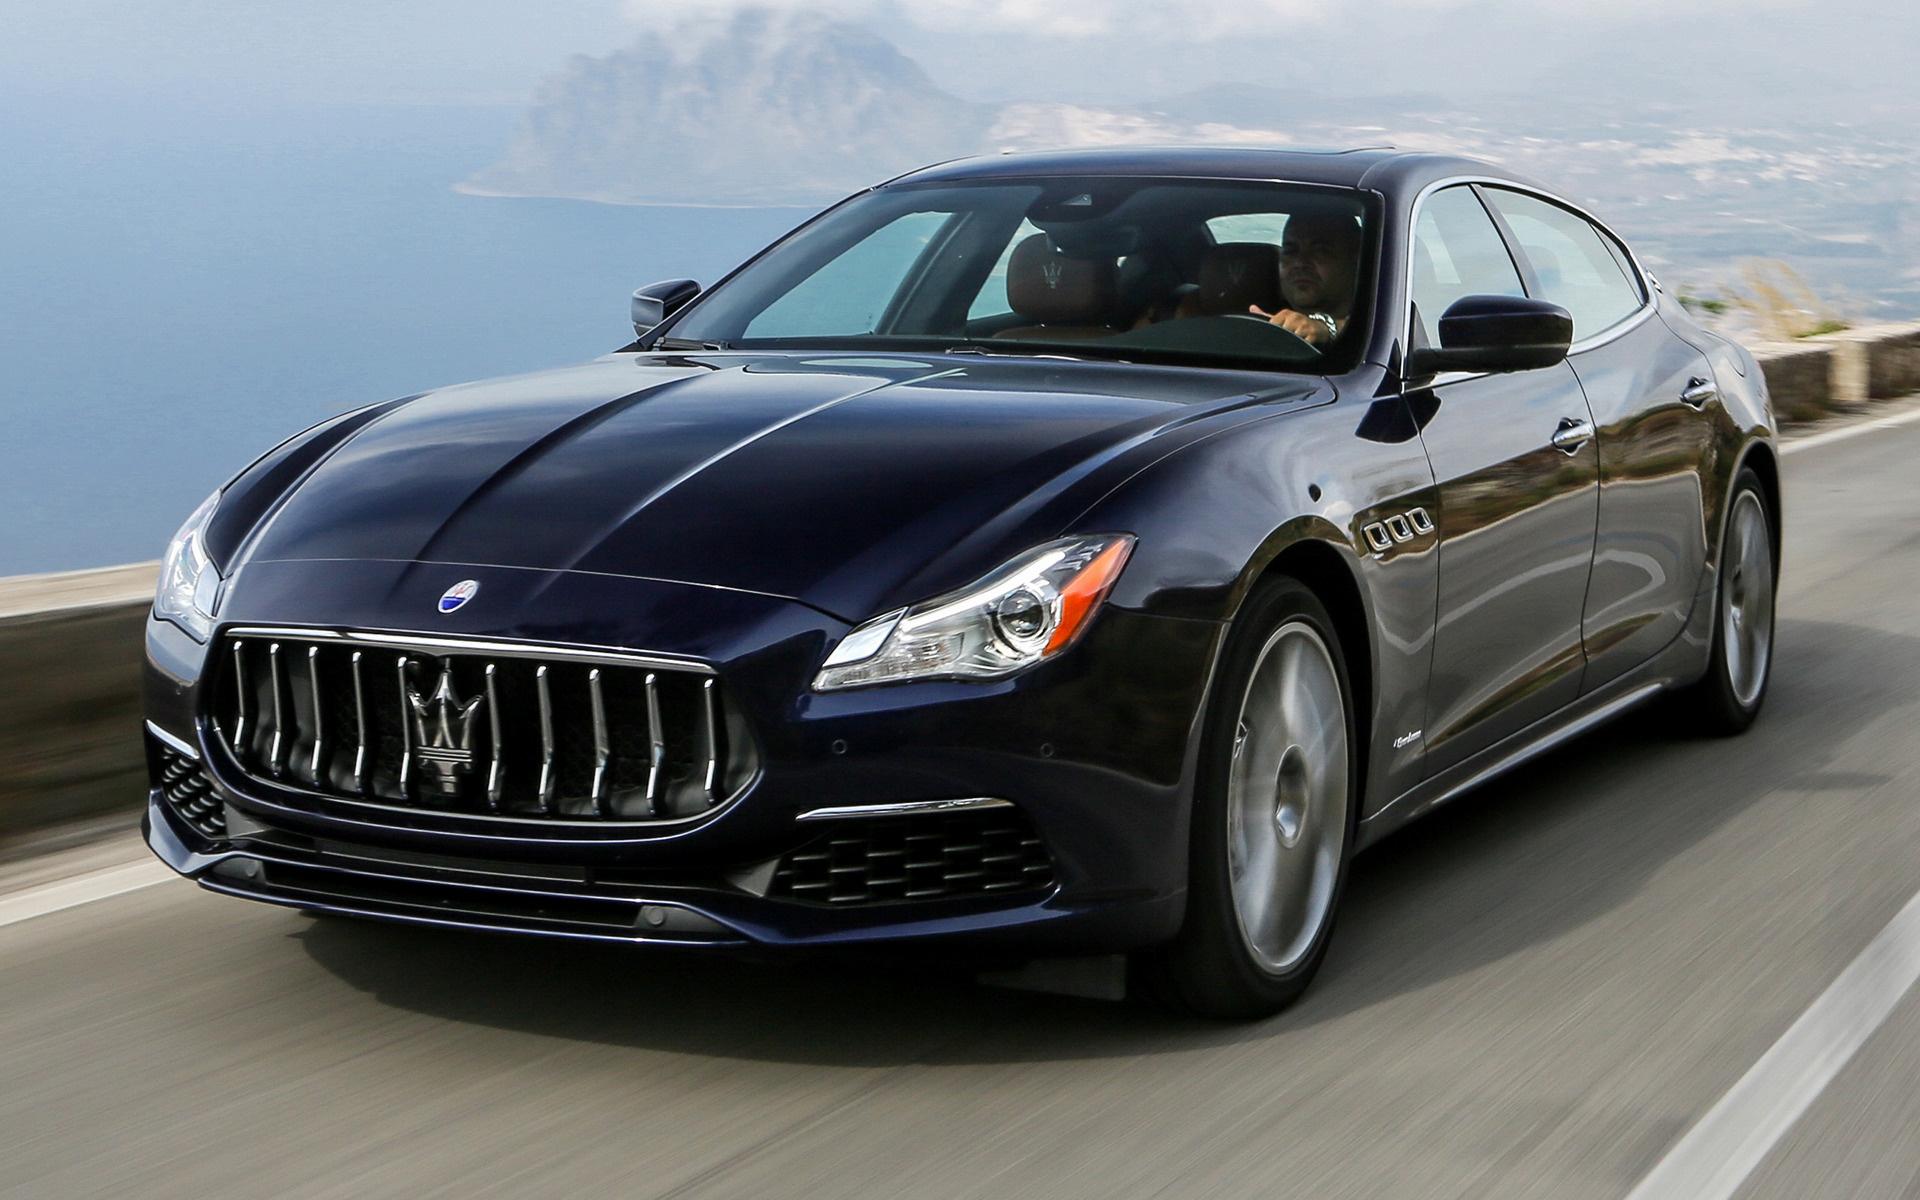 Maserati Quattroporte GTS GranLusso (2016) Wallpapers and ...